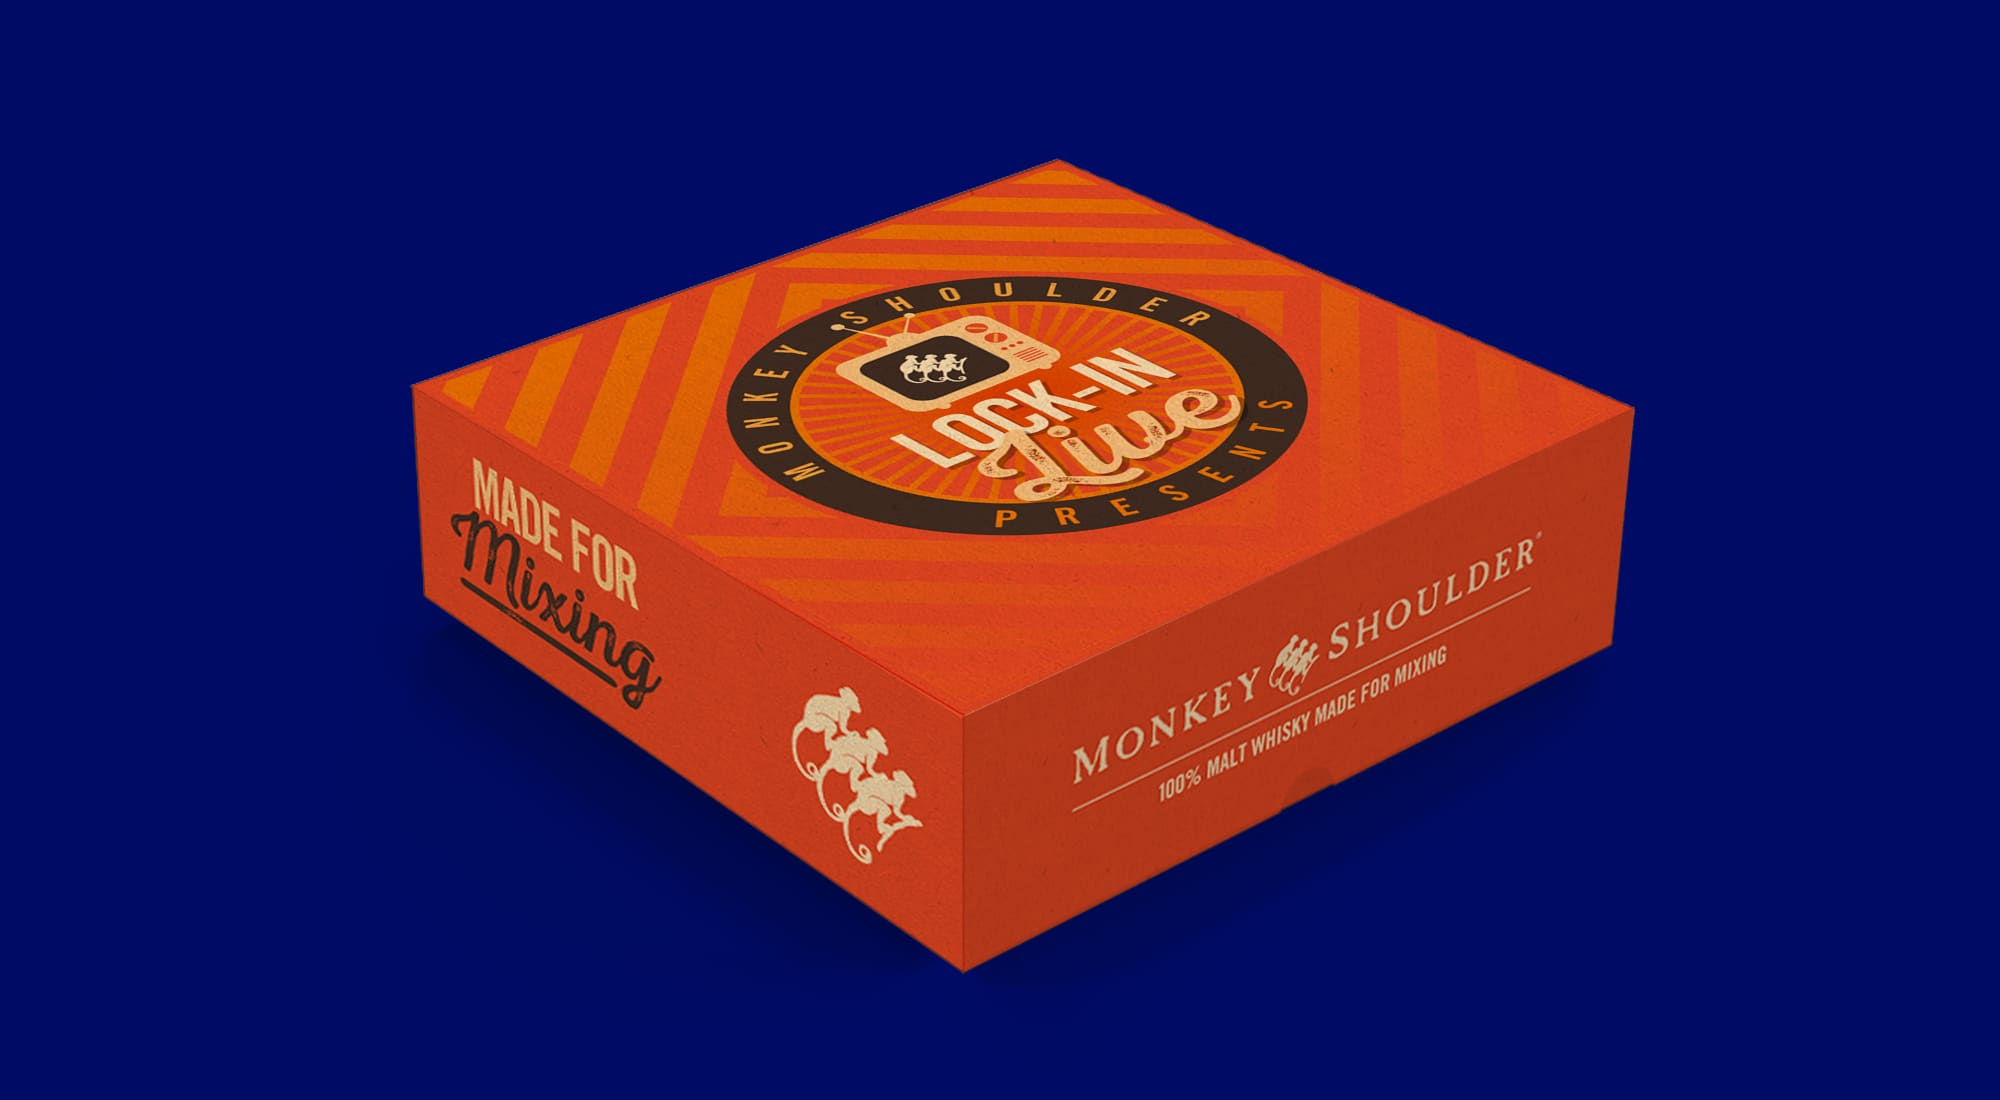 Monkey Shoulder live gift box